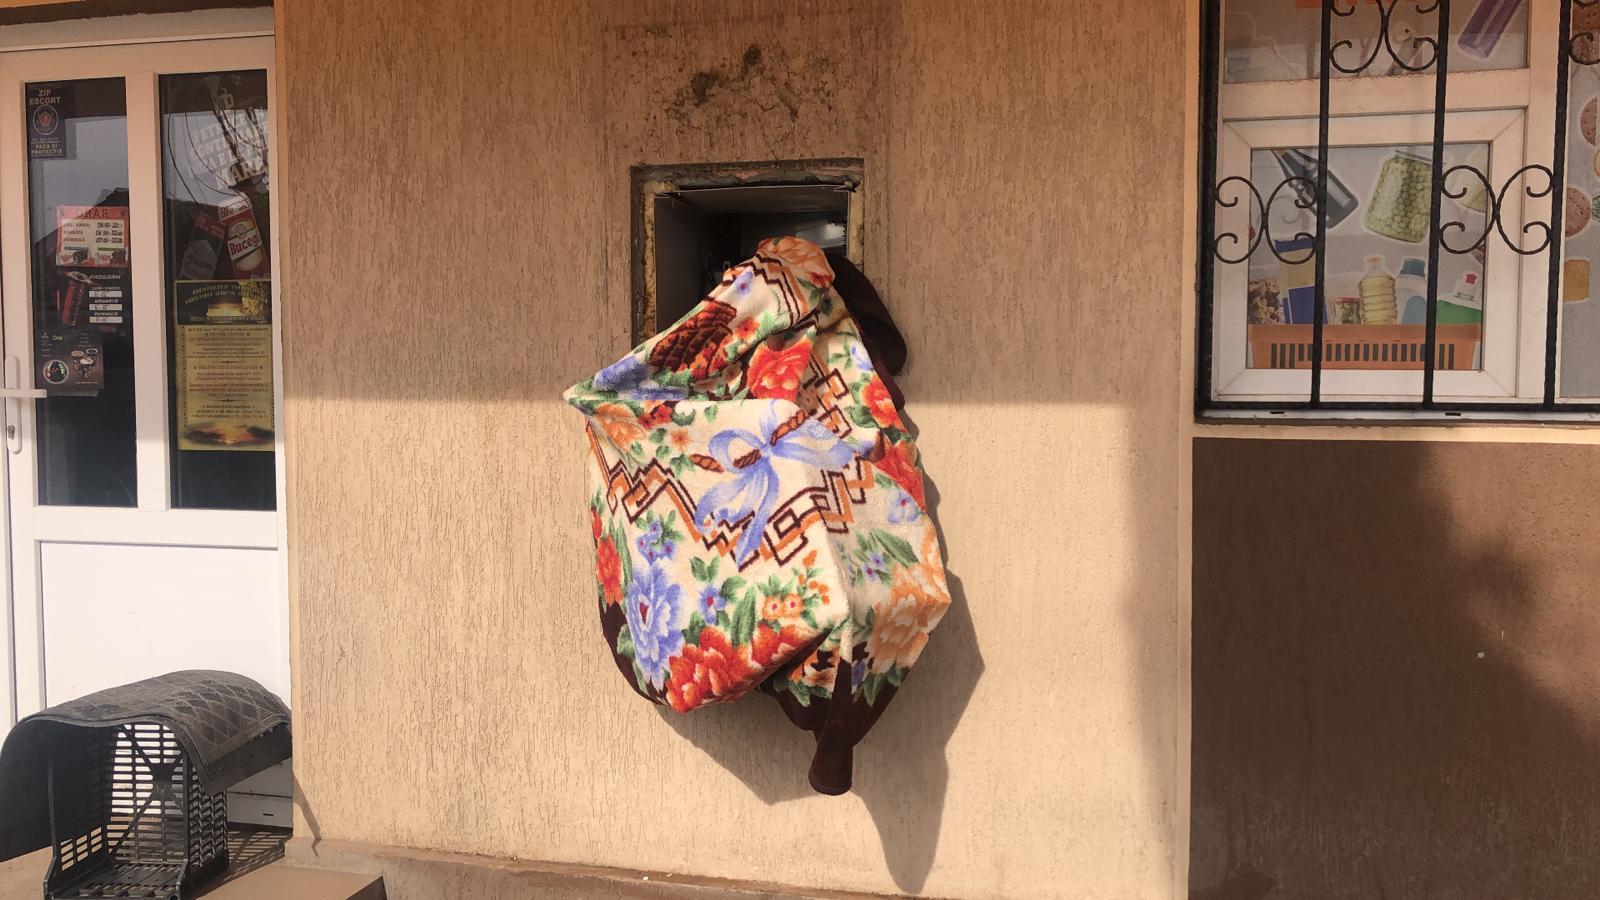 Atac la singurul bancomat din localitate. L-au aruncat in aer și au fugit cu banii